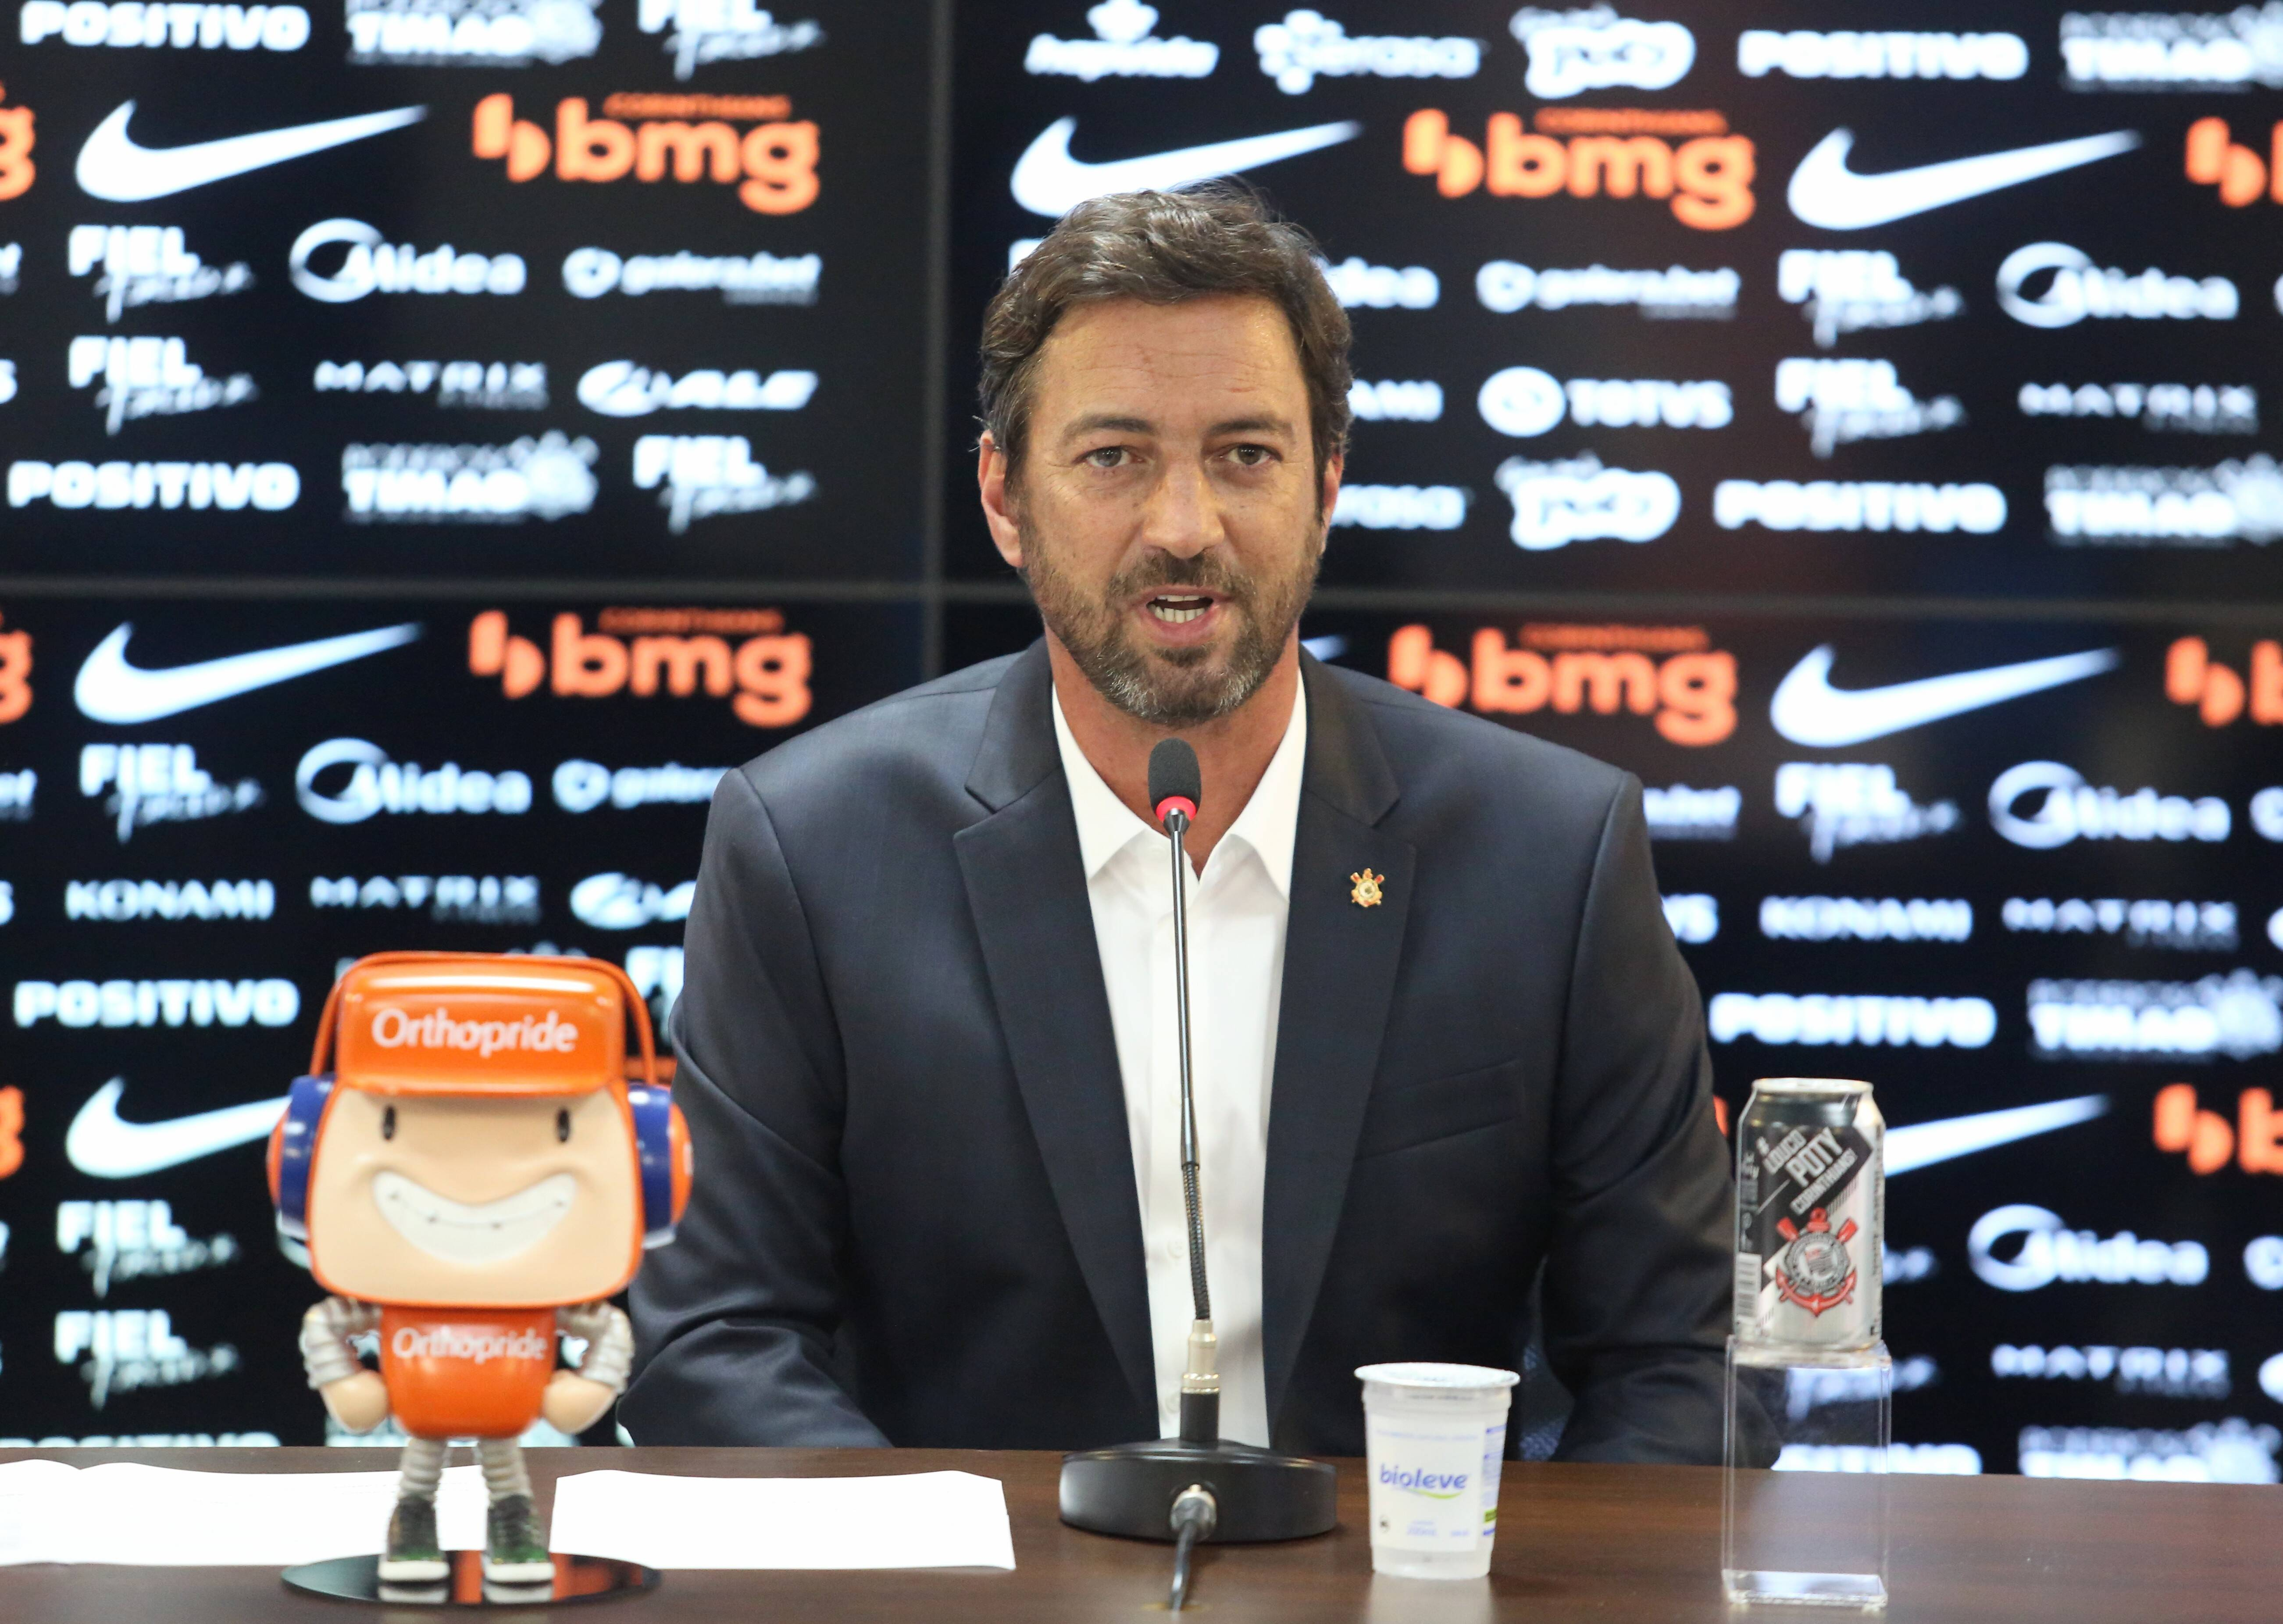 Foto: José Manoel Idalgo